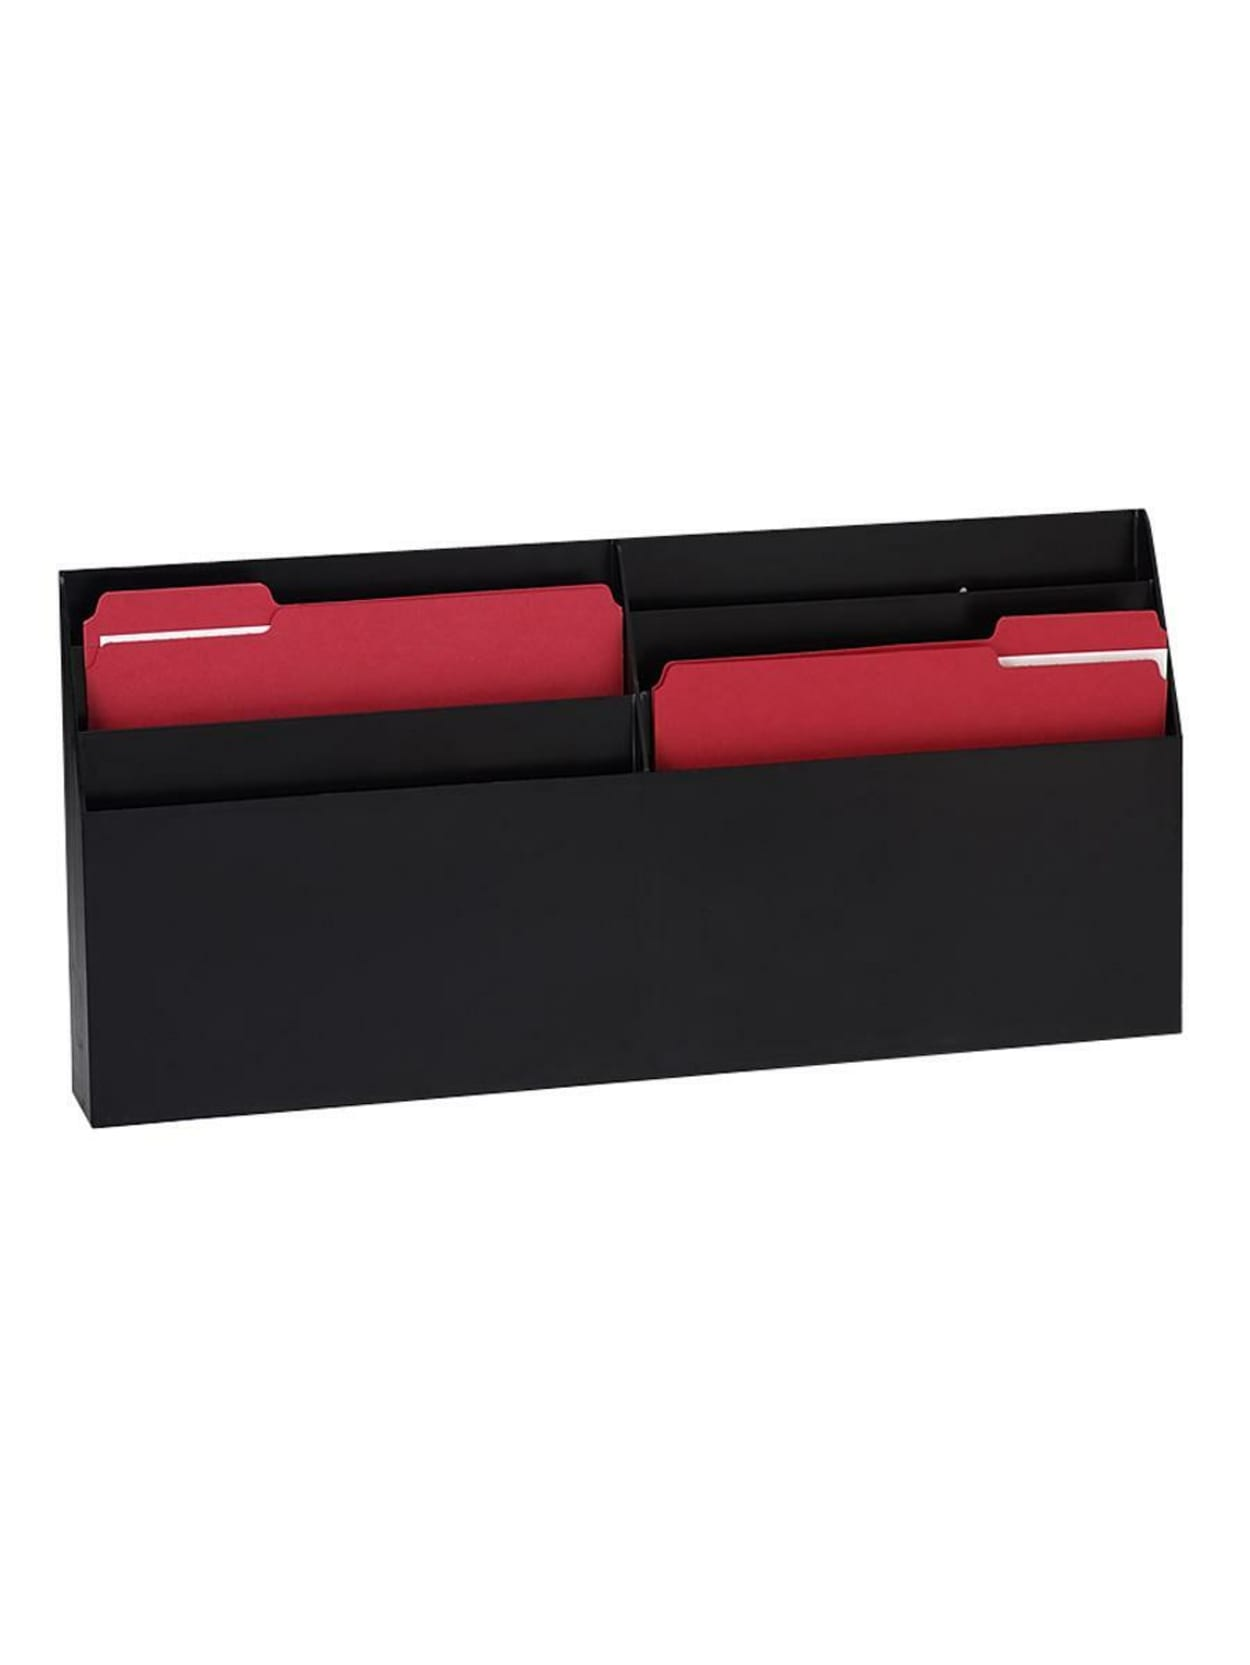 Eldon Optimizers 6 Pocket Organizer 11 5 H X 24 6 W X 2 8 D Black Office Depot